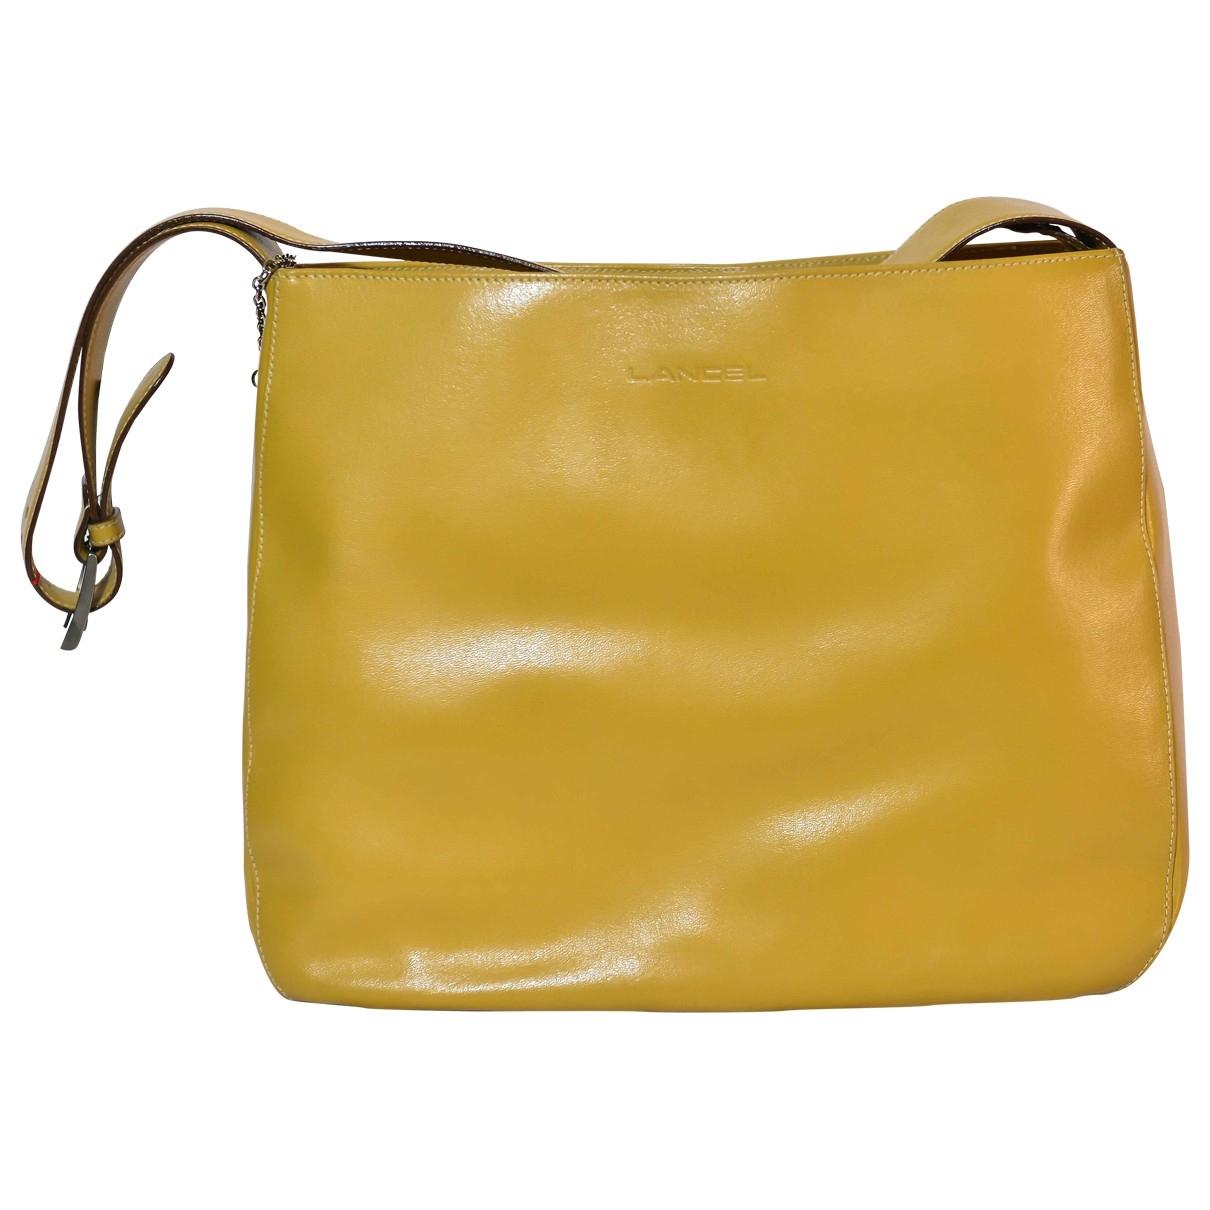 Lancel \N Yellow Leather handbag for Women \N